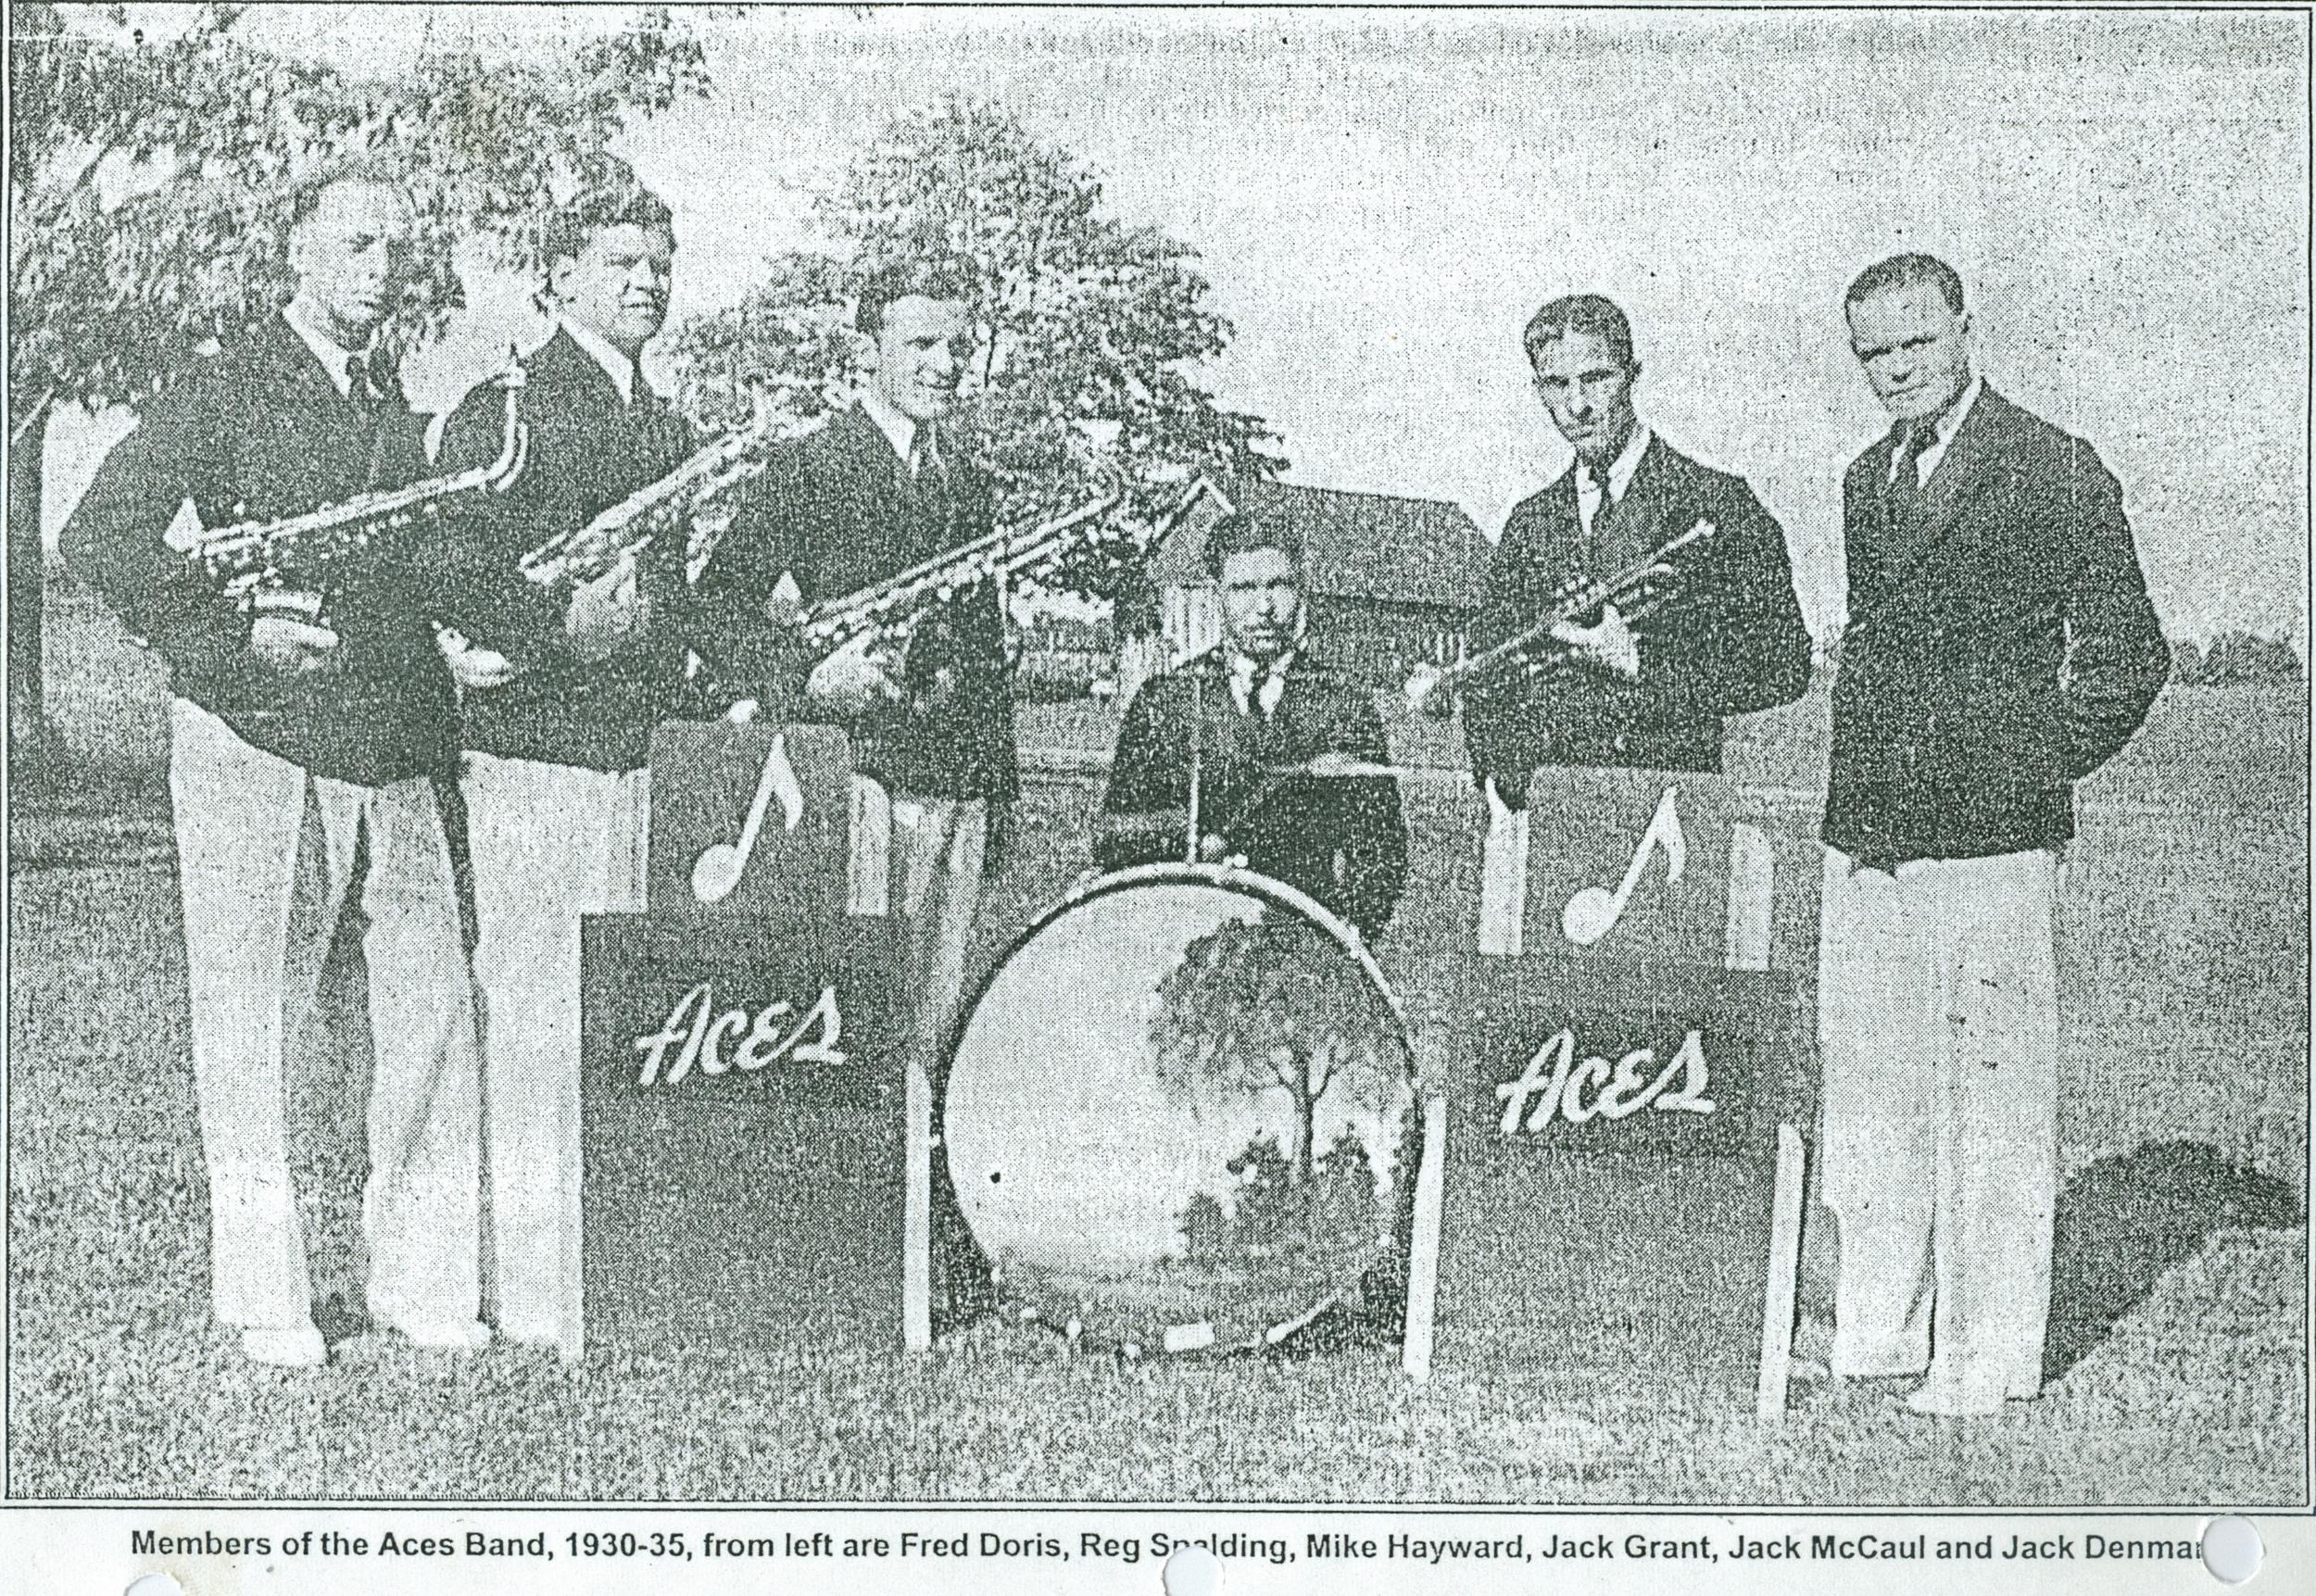 The Aces, 1930-1935, Fred Doris, Reg Spalding, Mike Hayward, Jack Grant, Jack McCaul, Jack Denmark.jpg